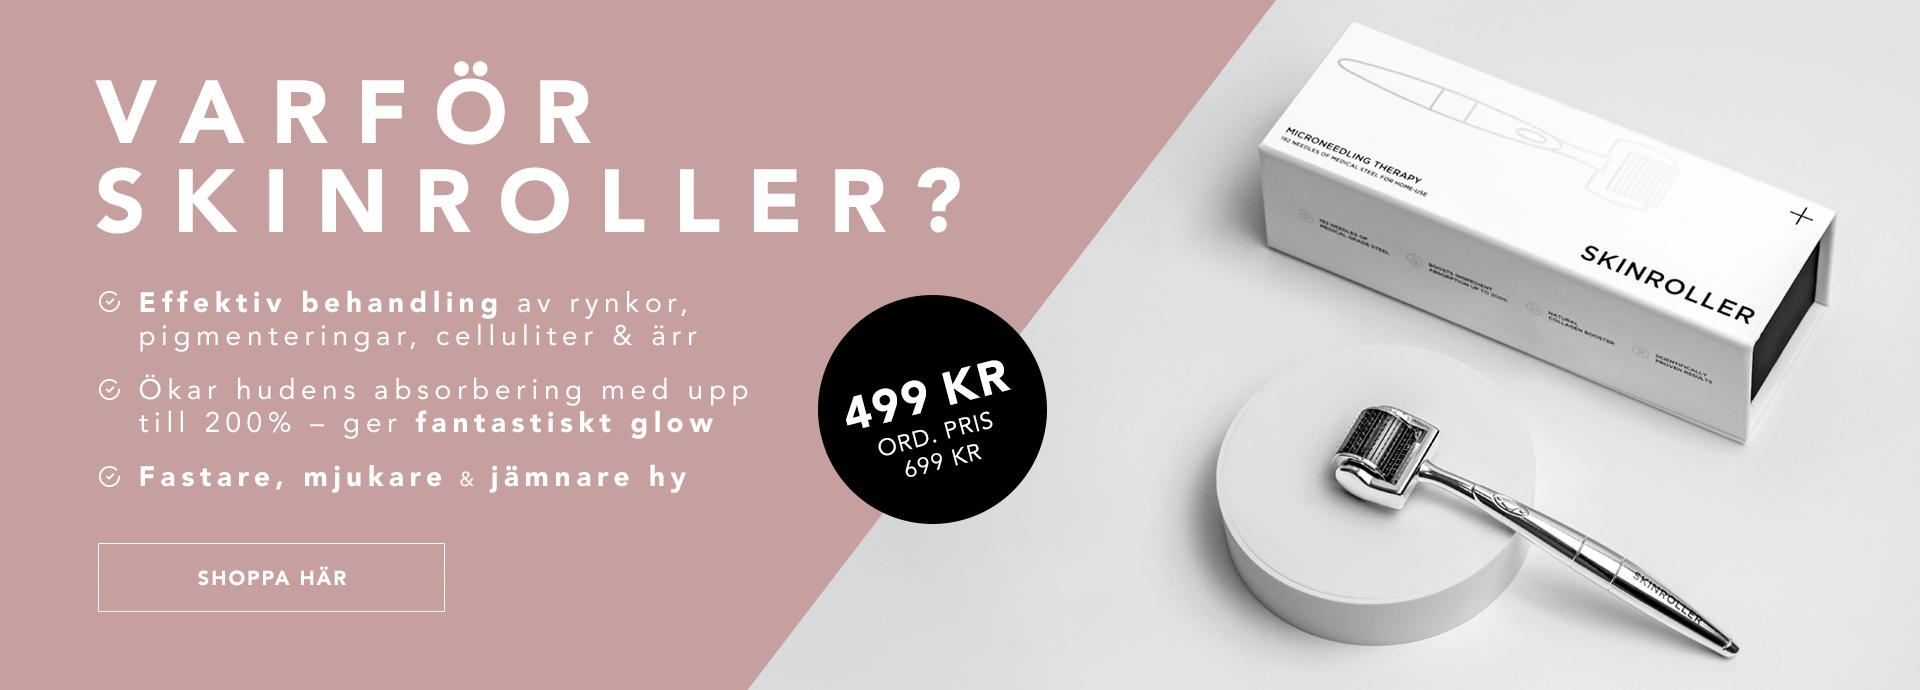 https://www.skinroller.se/image/5645/kampanjsida-hero-silver-DESKTOP.jpg